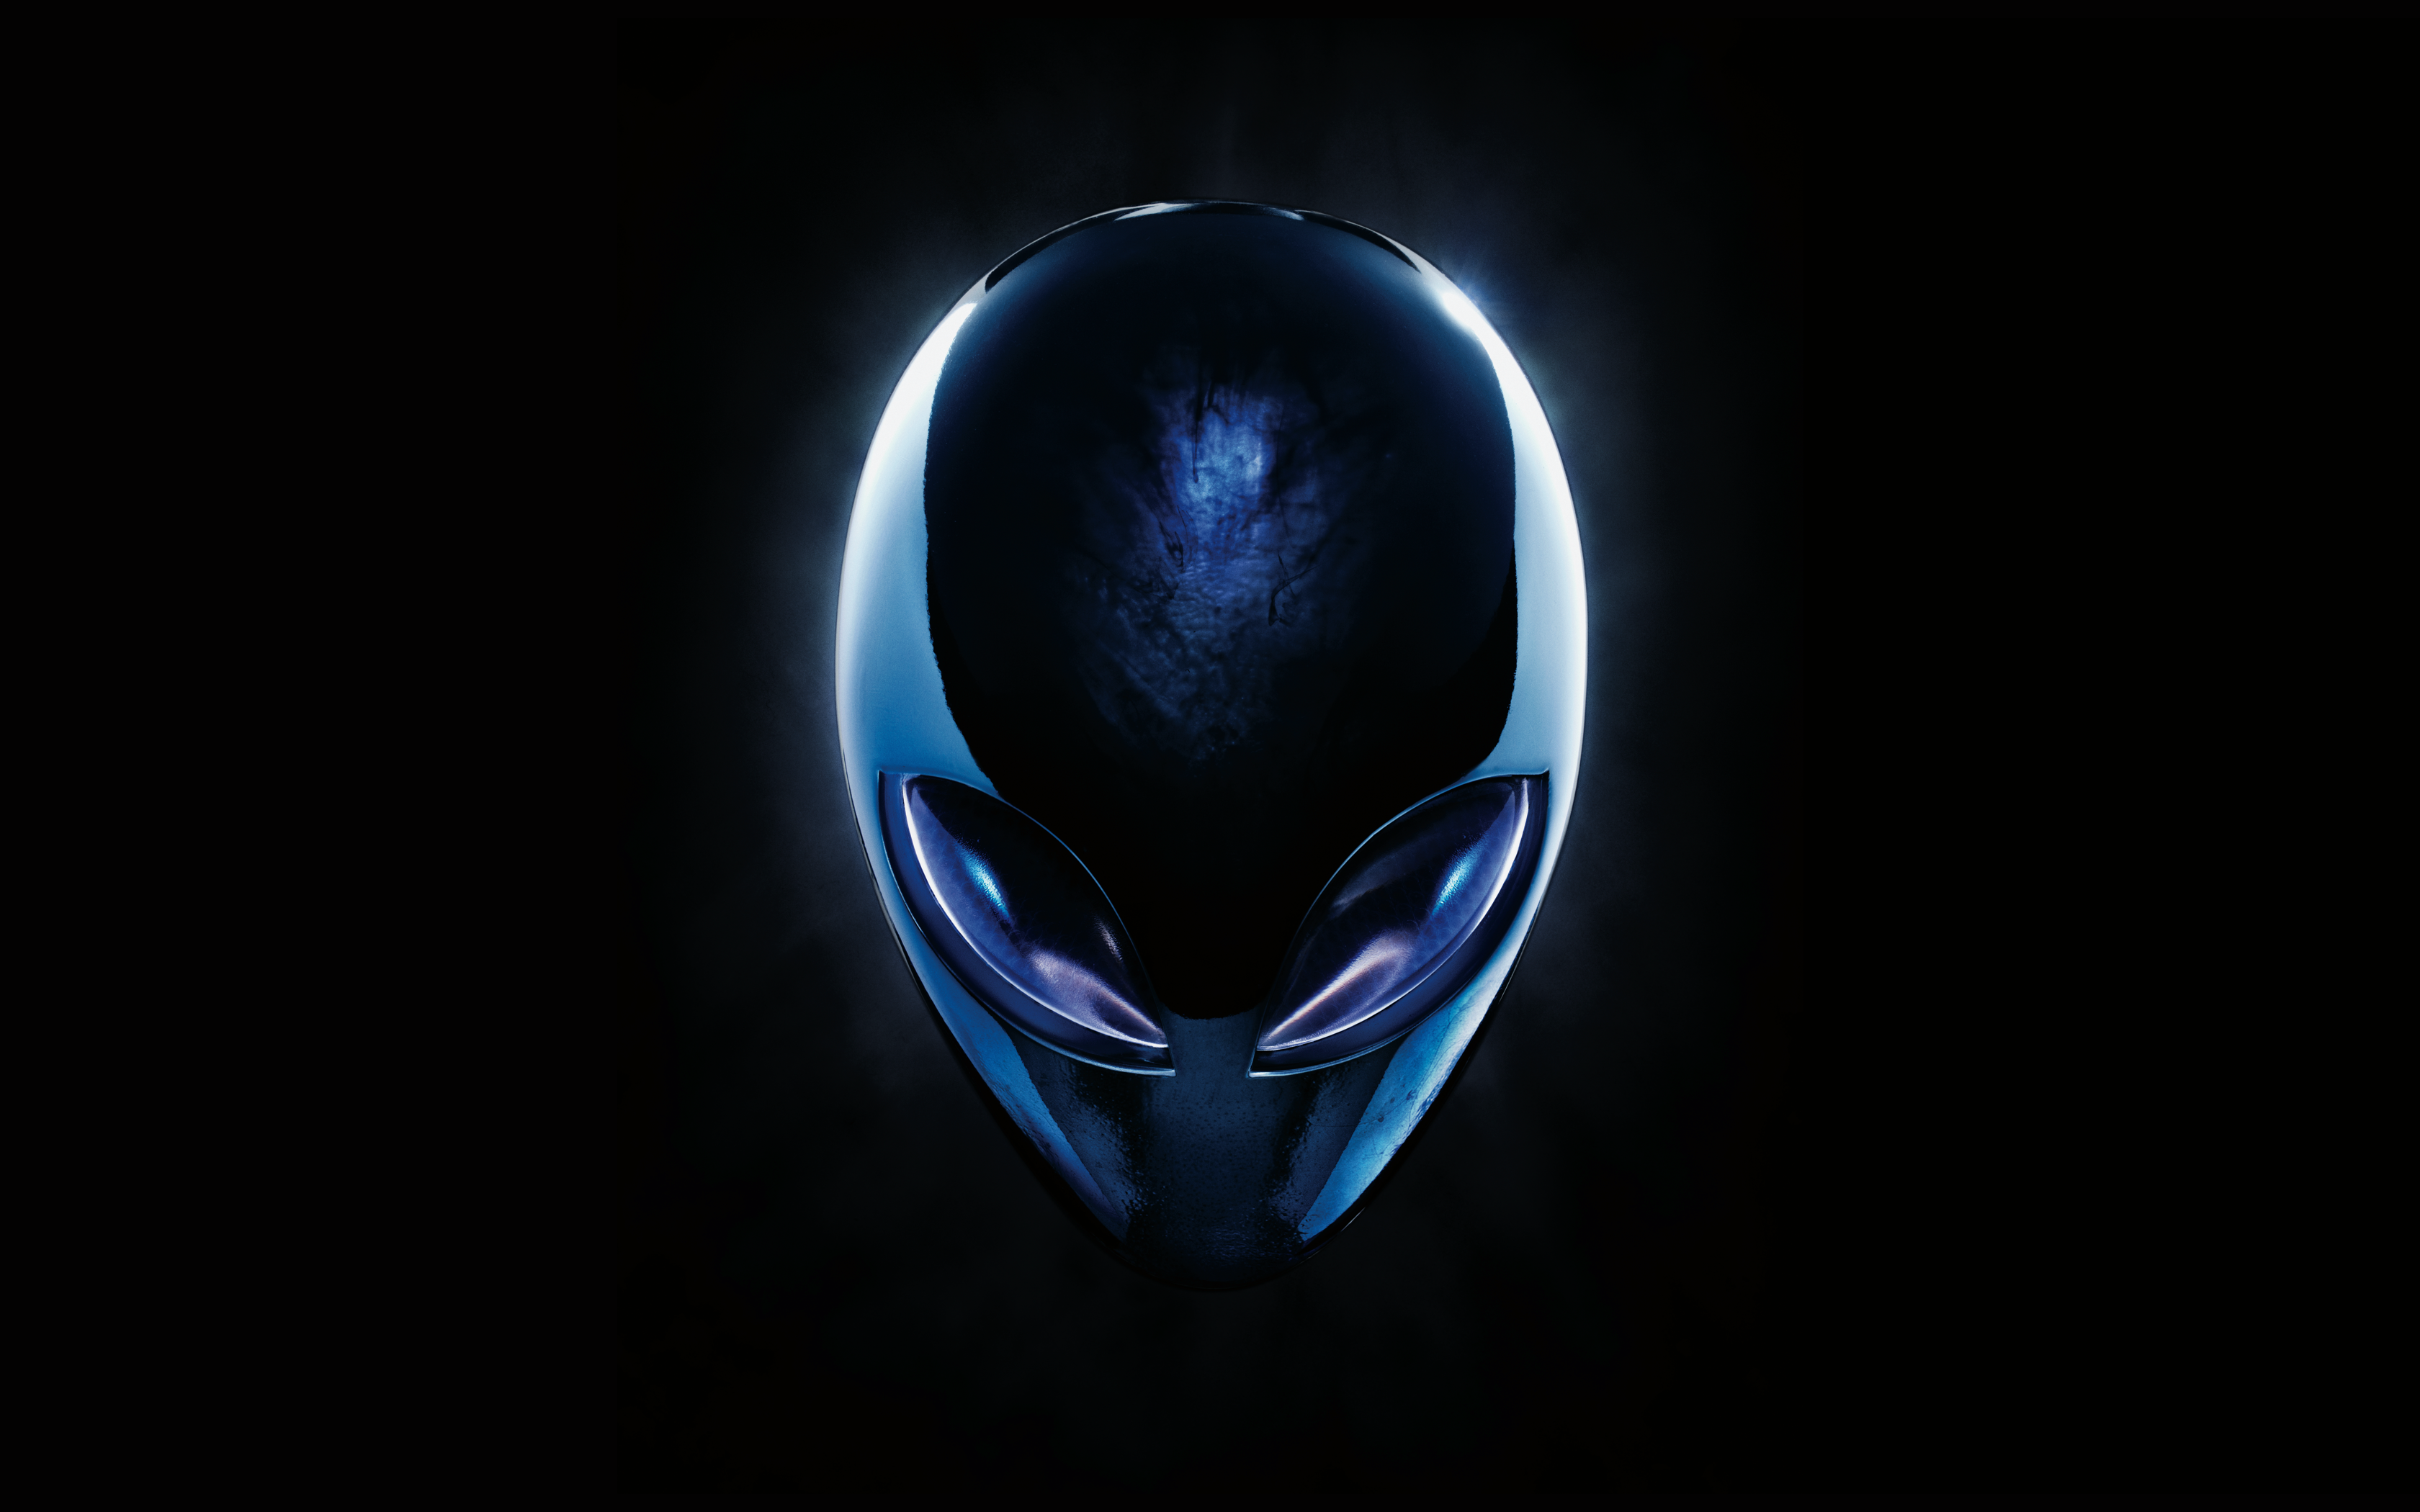 Amazing Alienware Pictures & Backgrounds